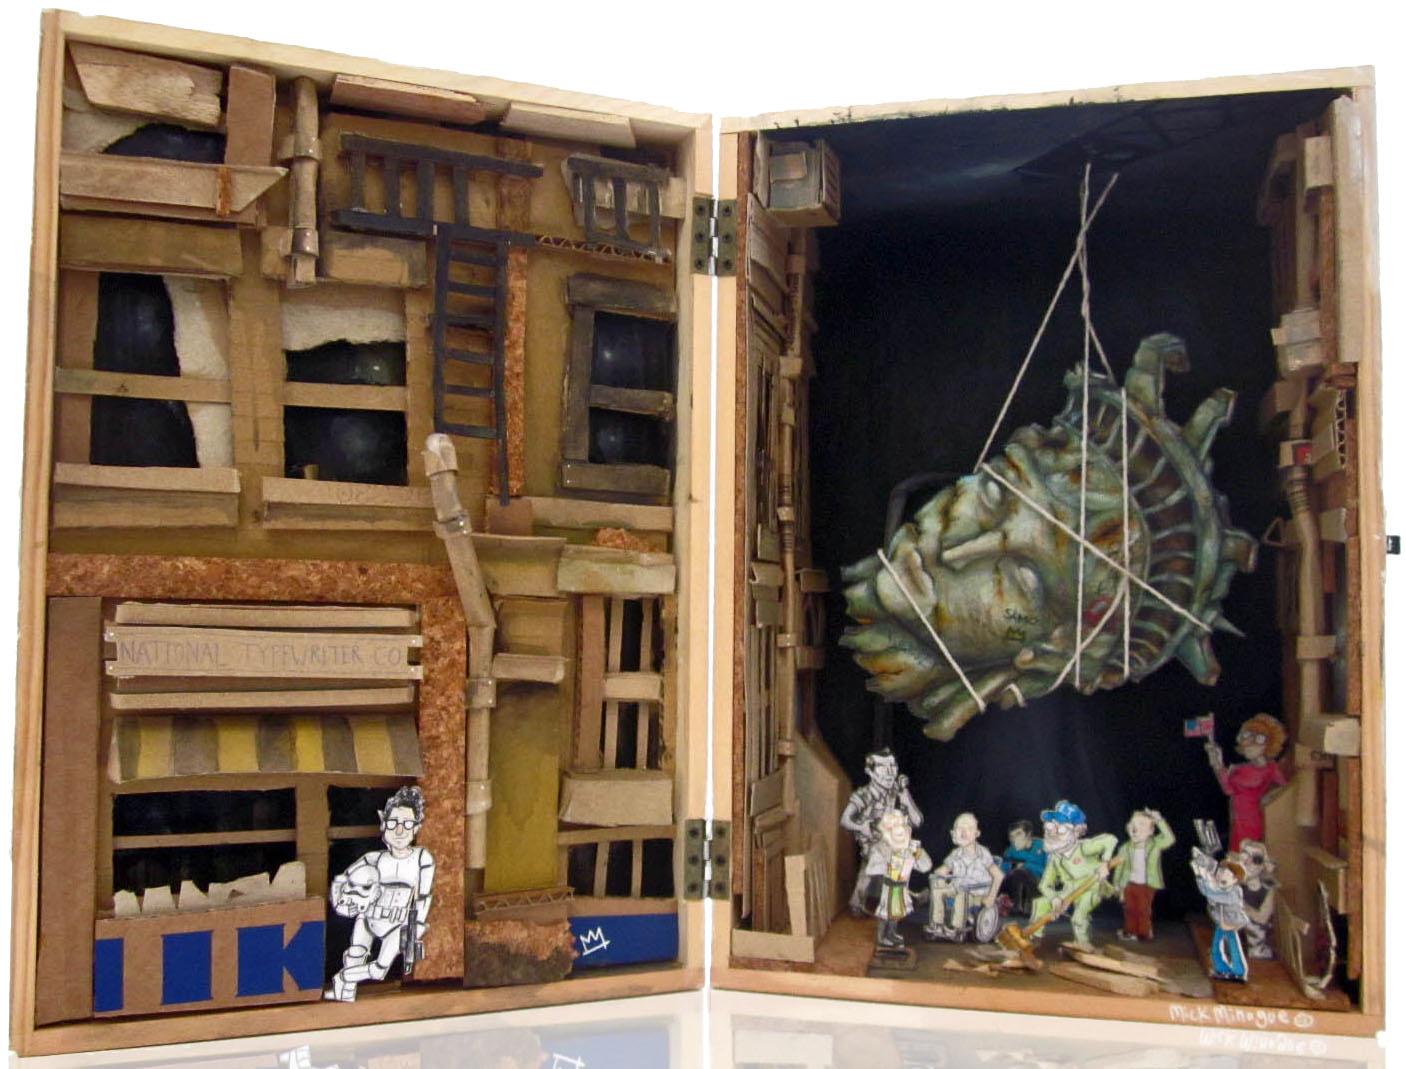 JJ Abrams Mystery Box by Mick Minogue